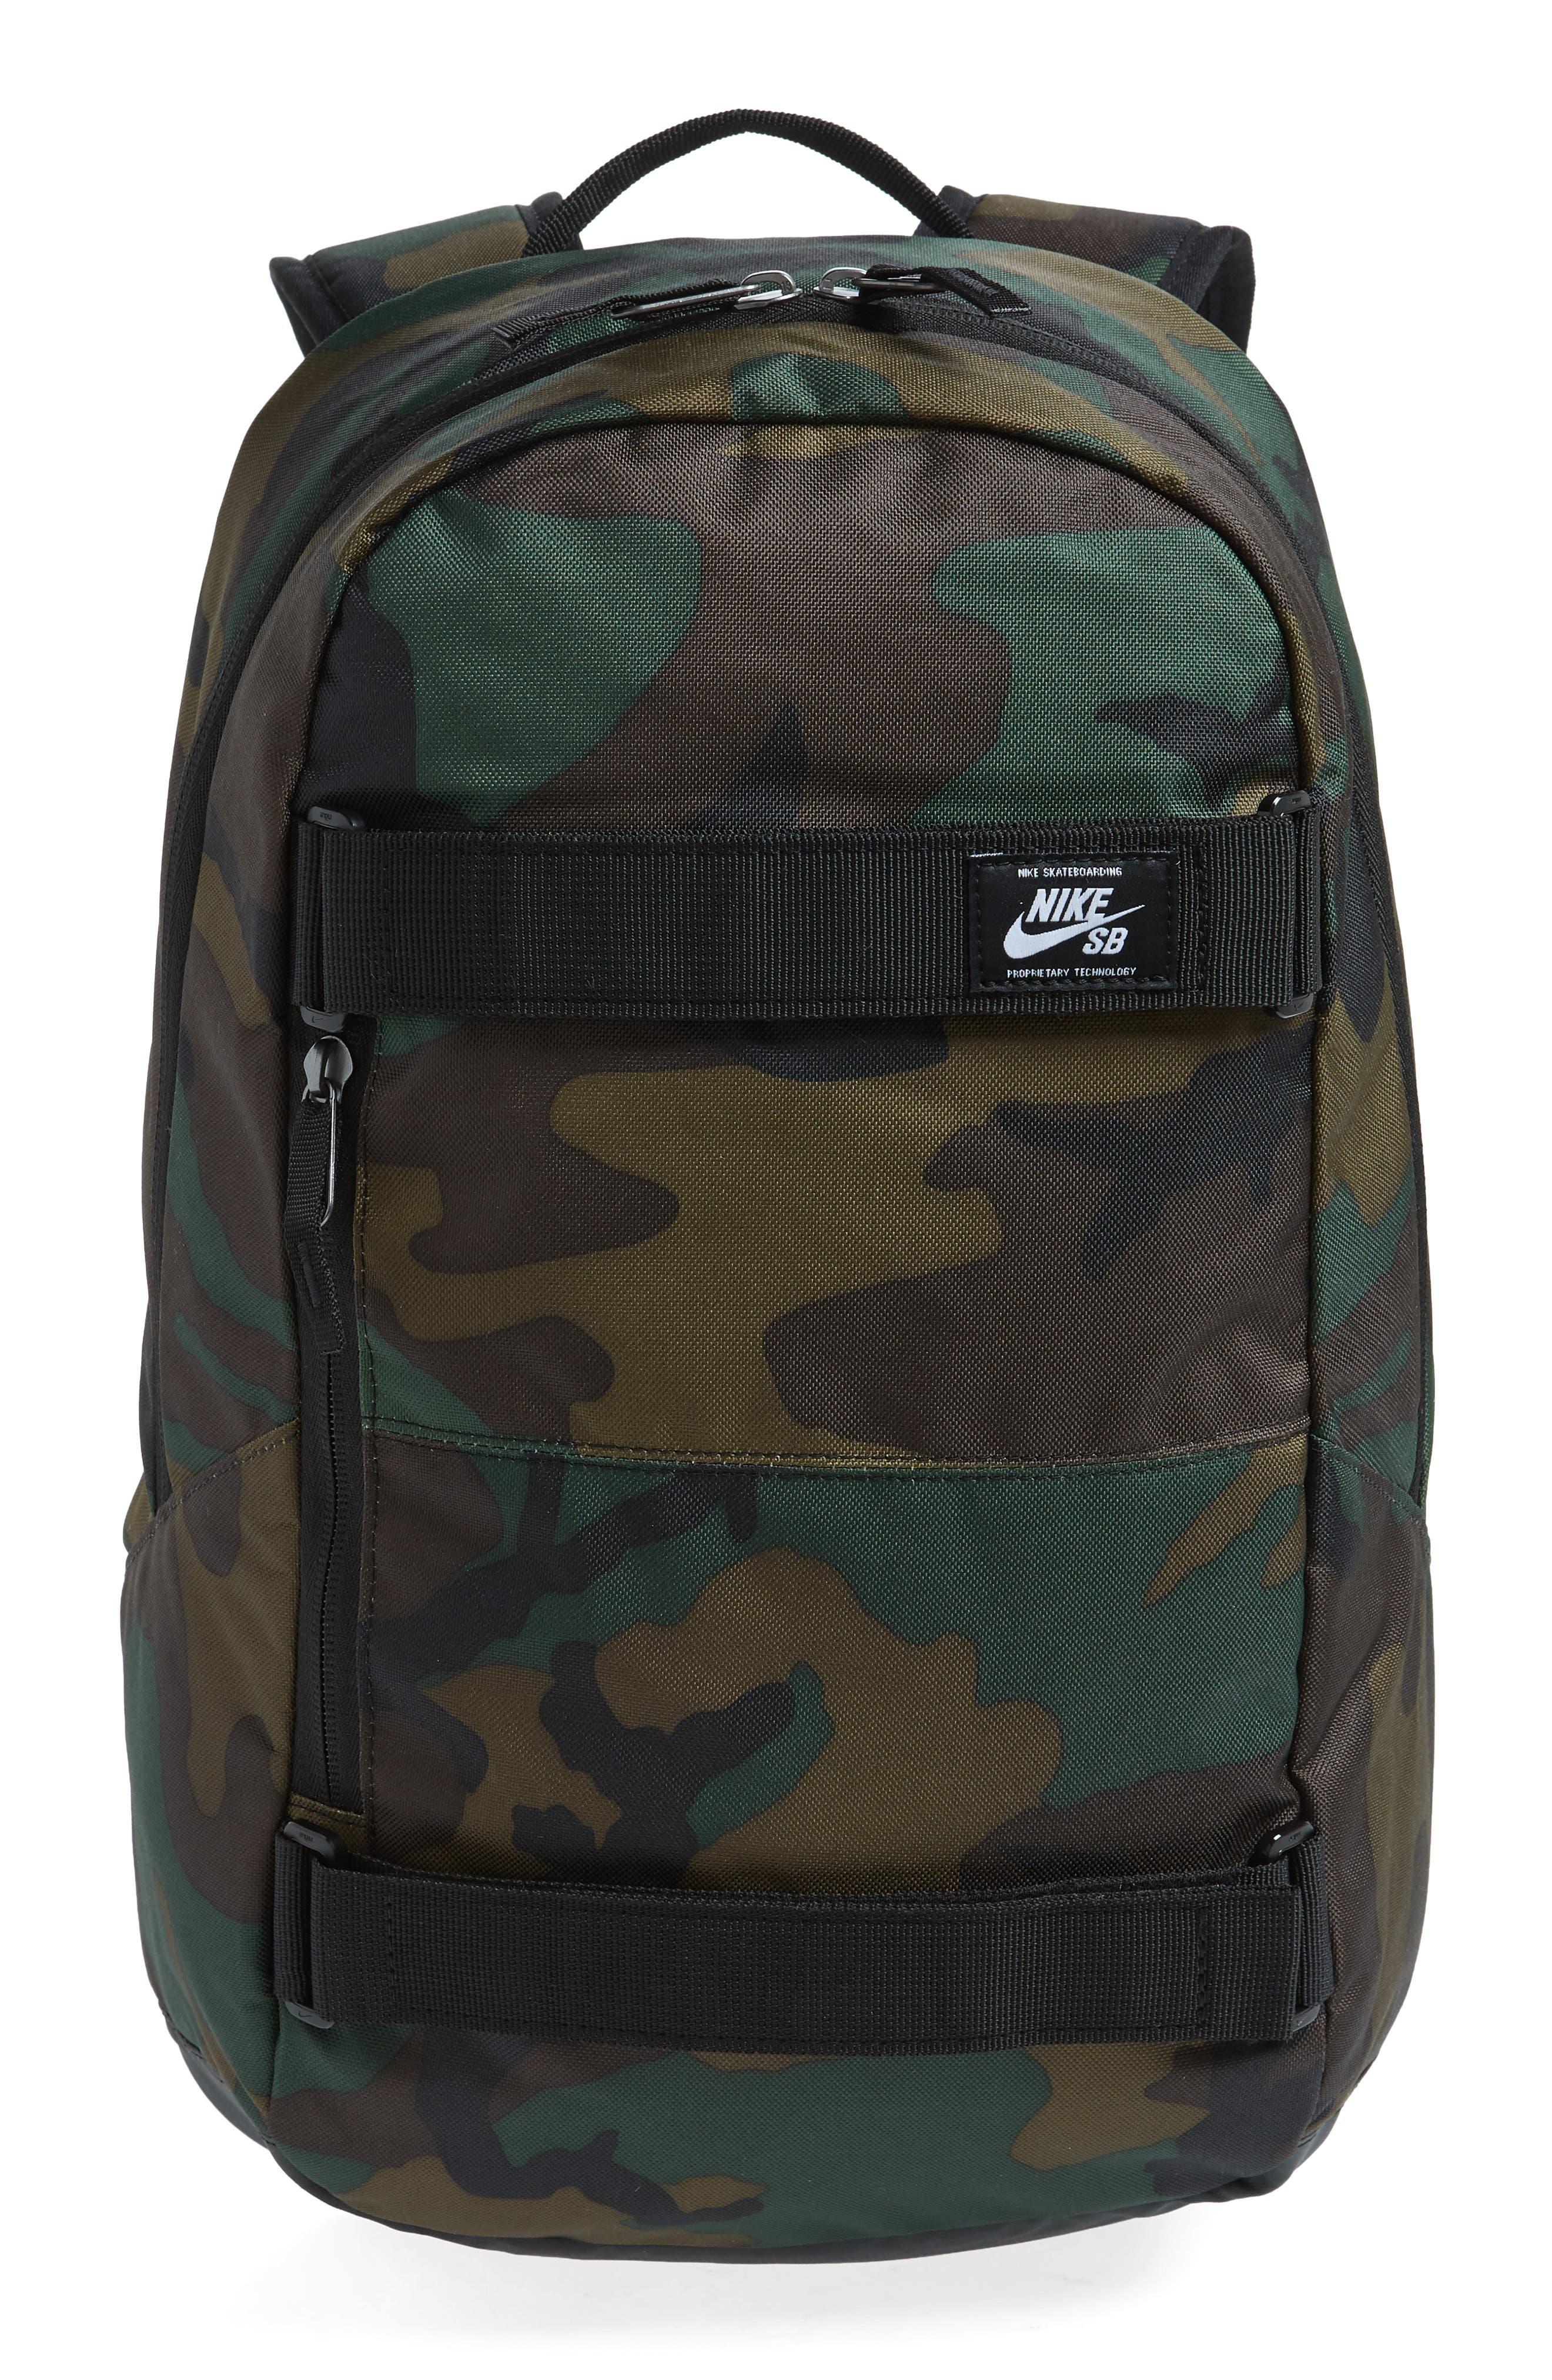 Courthouse Backpack,                         Main,                         color, Iguana/ Black/ White